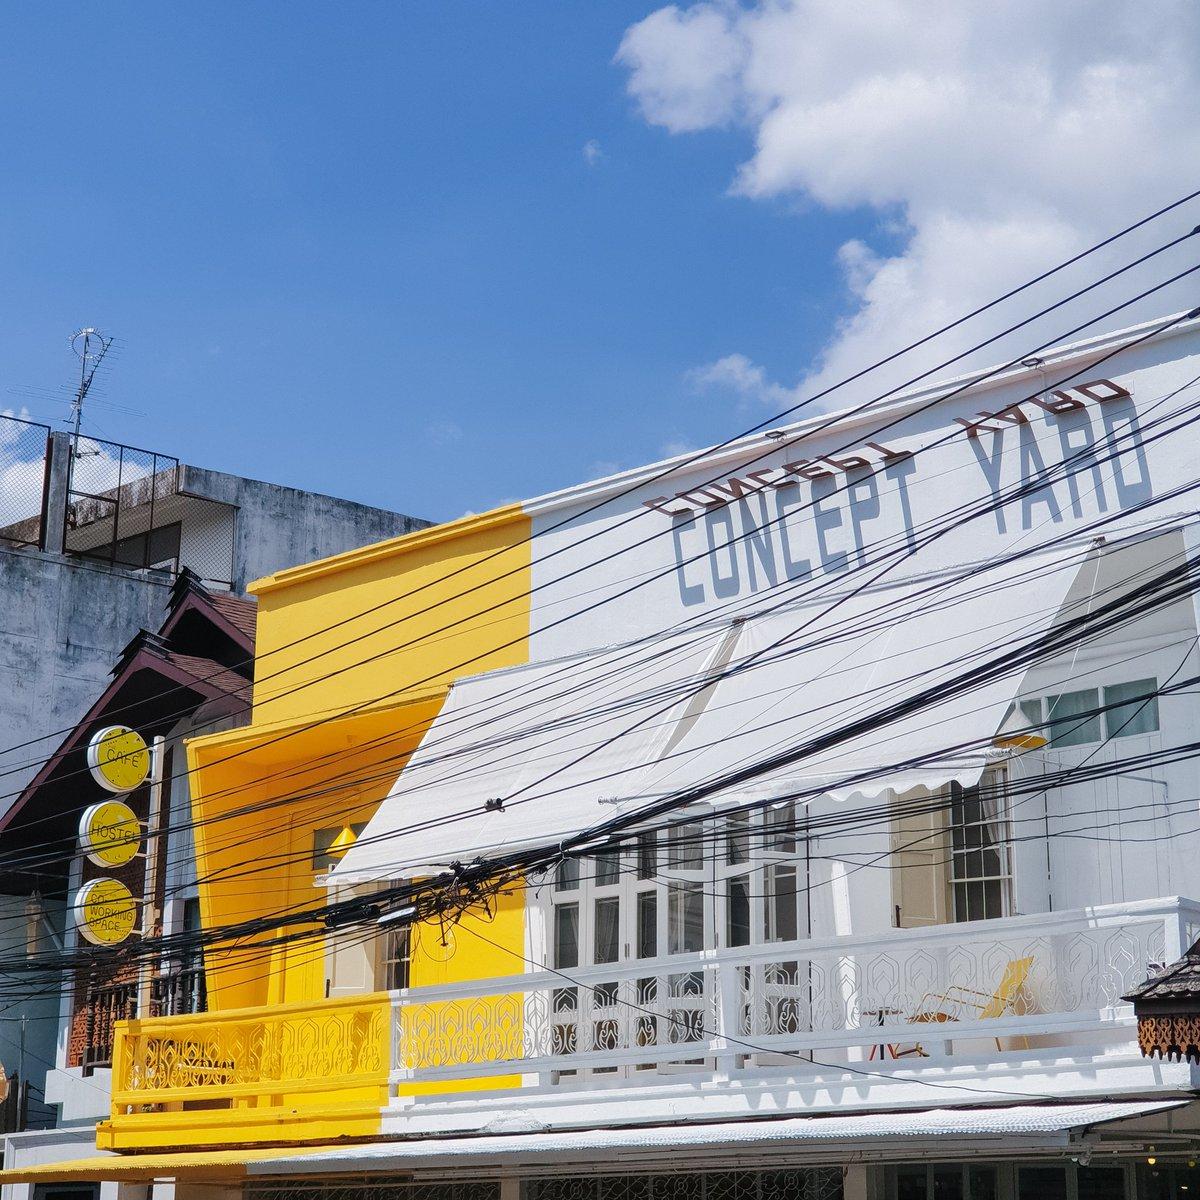 Concept yard Chiangrai   #เชียงราย #คาเฟ่เชียงราย #ร้านกาแฟเชียงราย #รีวิวเชียงราย #reviewchiangrai #chiangrai #cafechiangrai #adayinchiangraipic.twitter.com/0a6h8UCV6x